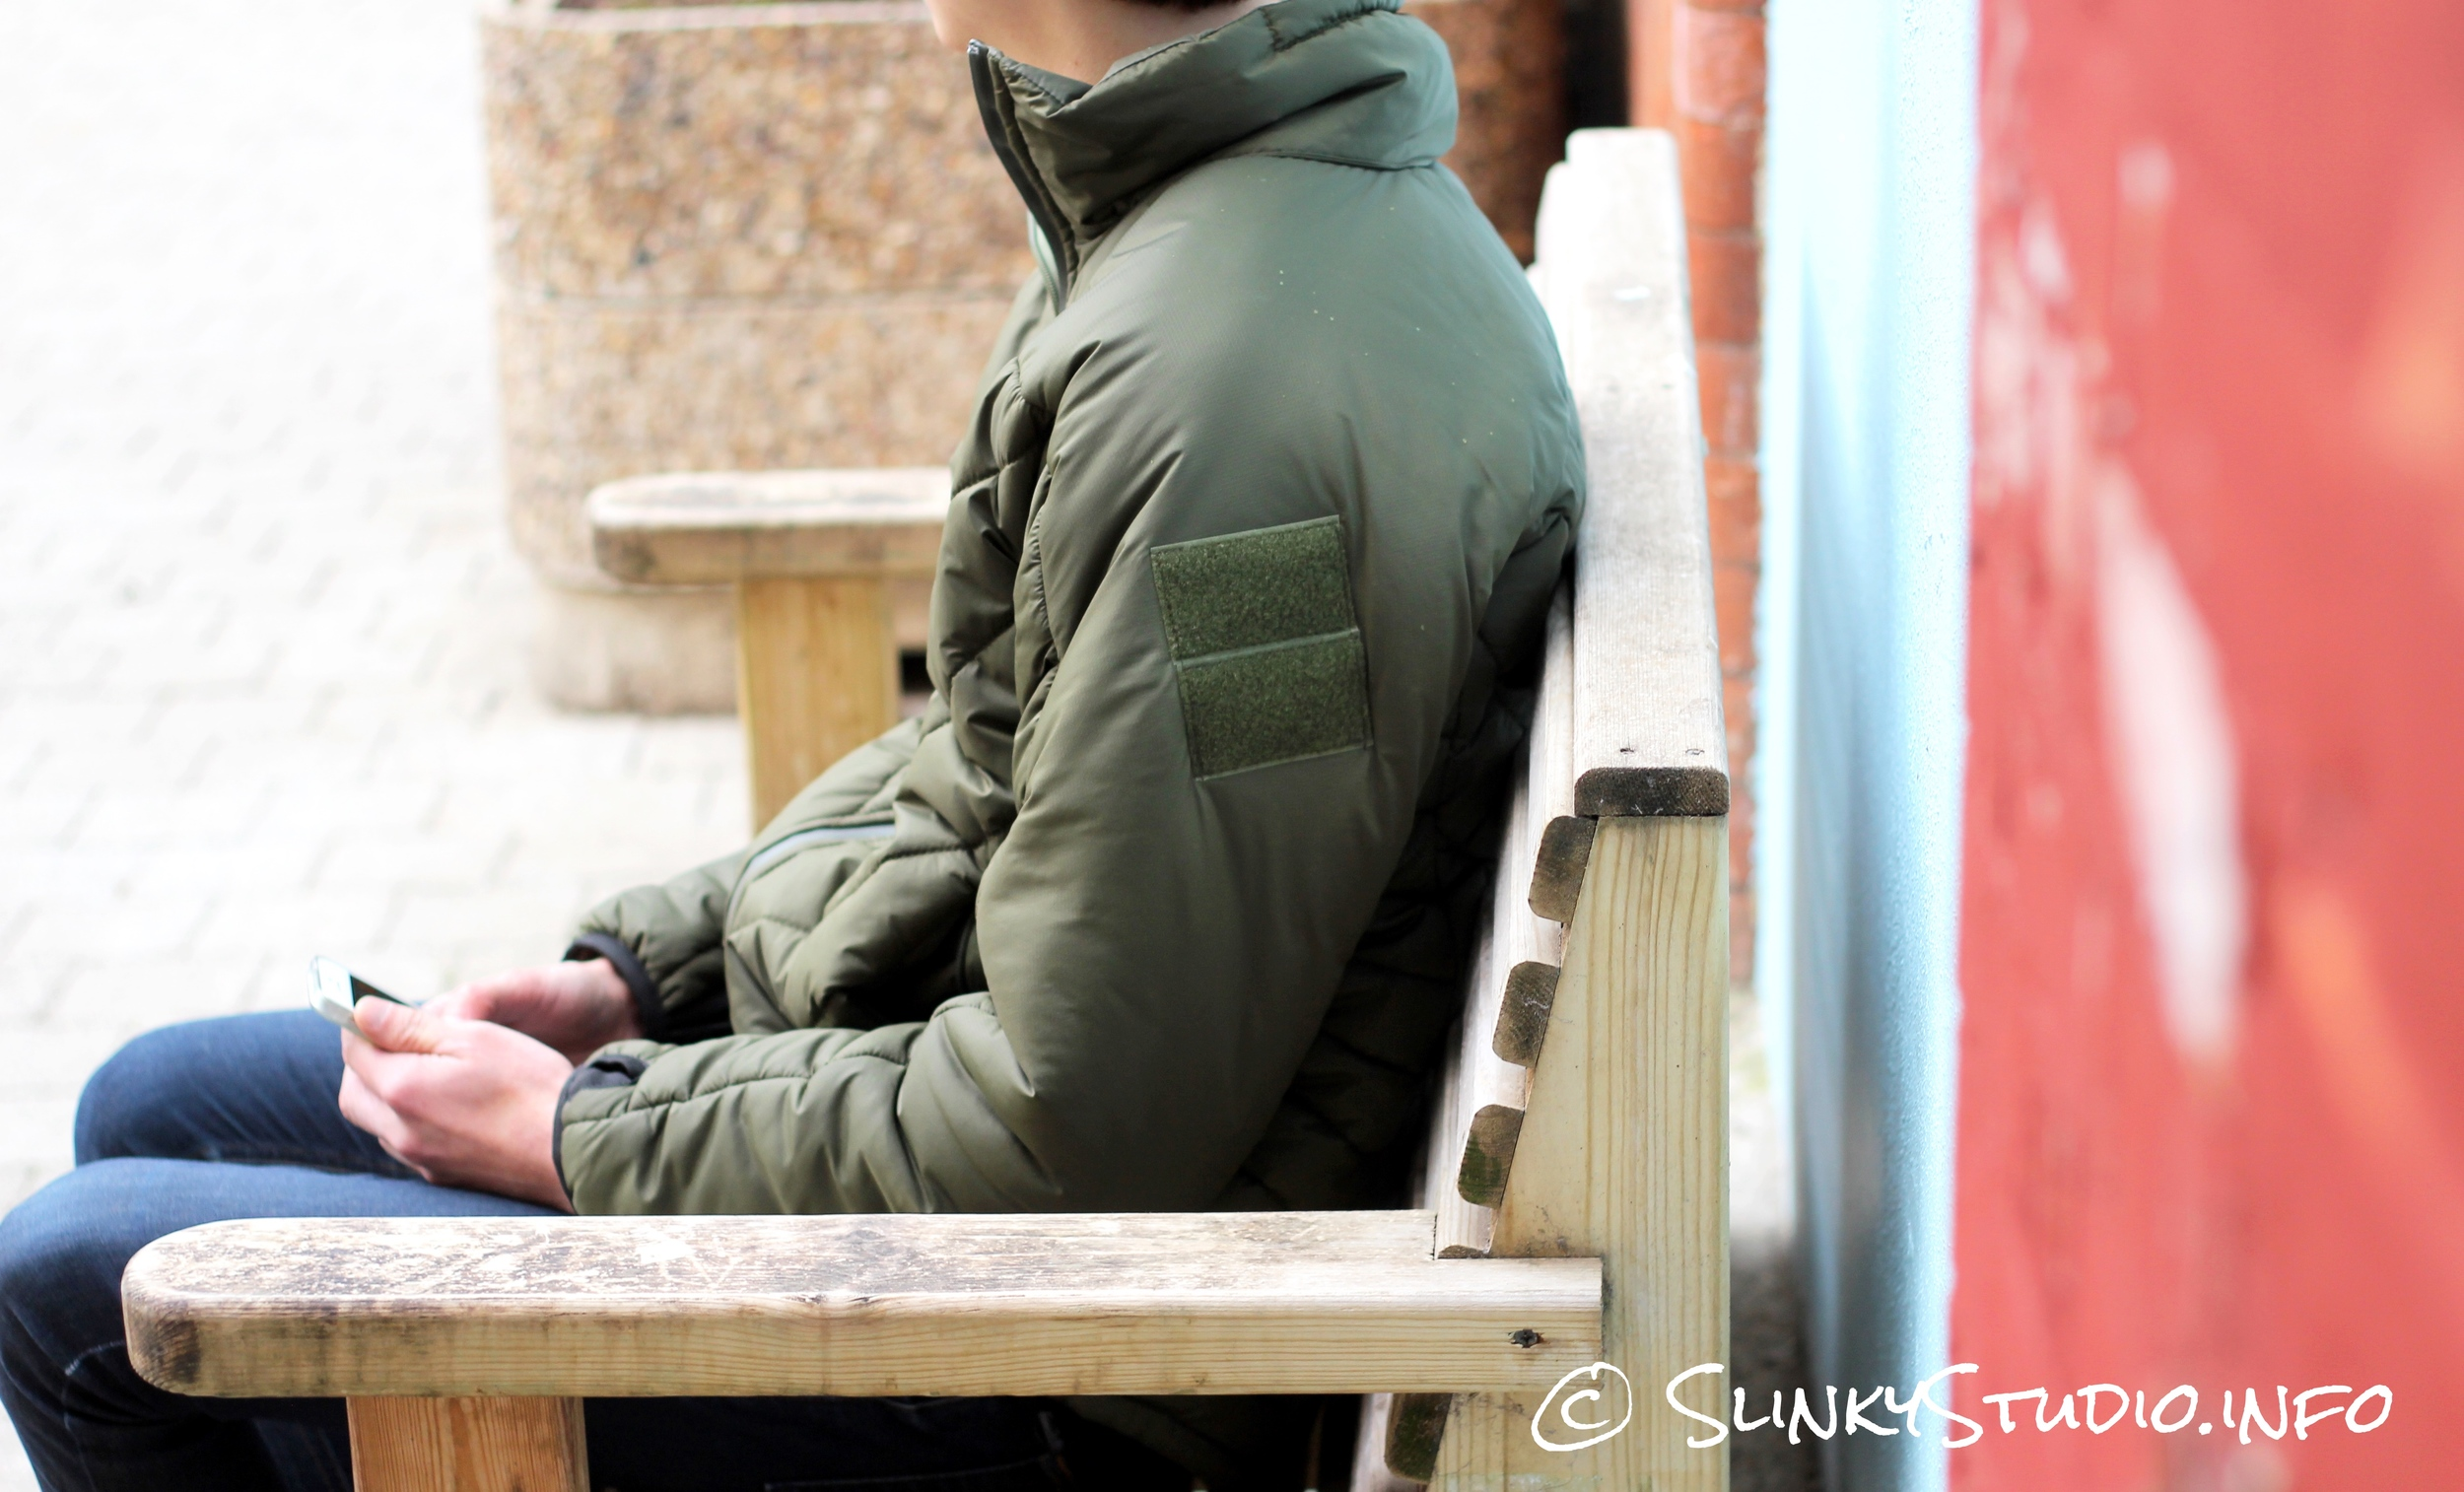 Snugpak SJ6 Jacket Sitting on Wooden Bench.jpg